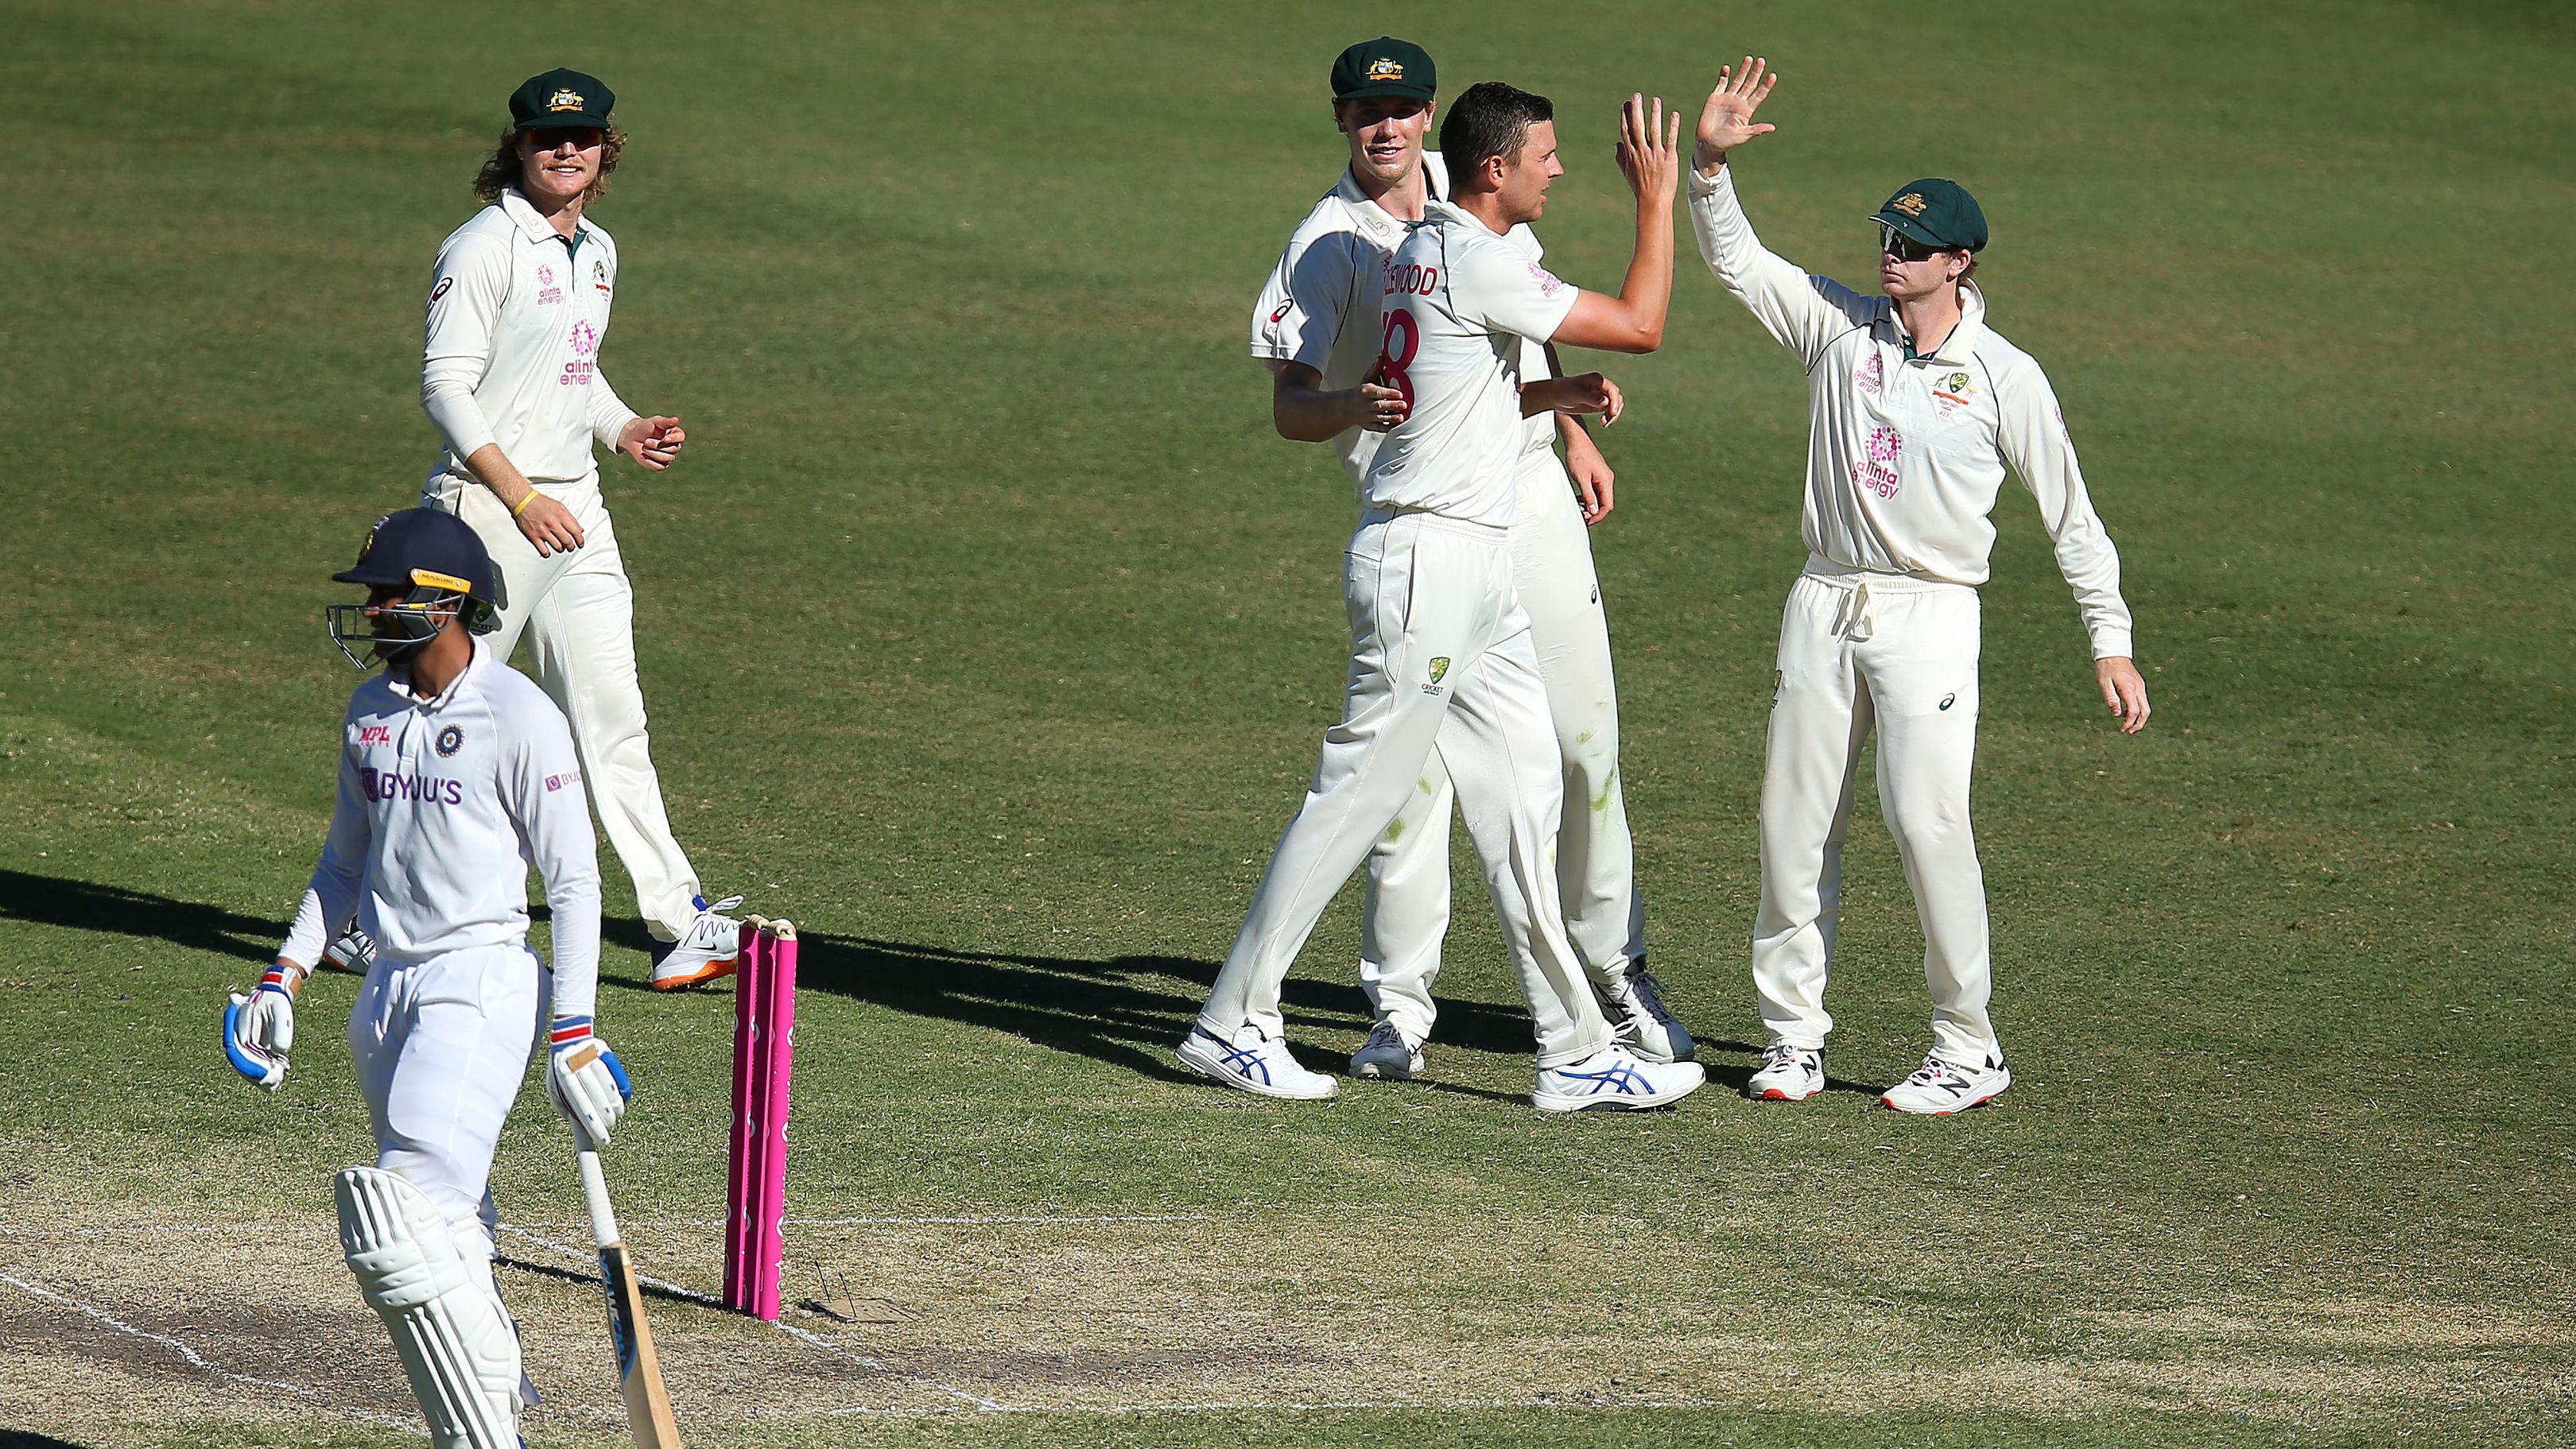 Josh Hazlewood of Australia celebrates after taking the wicket of Shubman Gill of India.